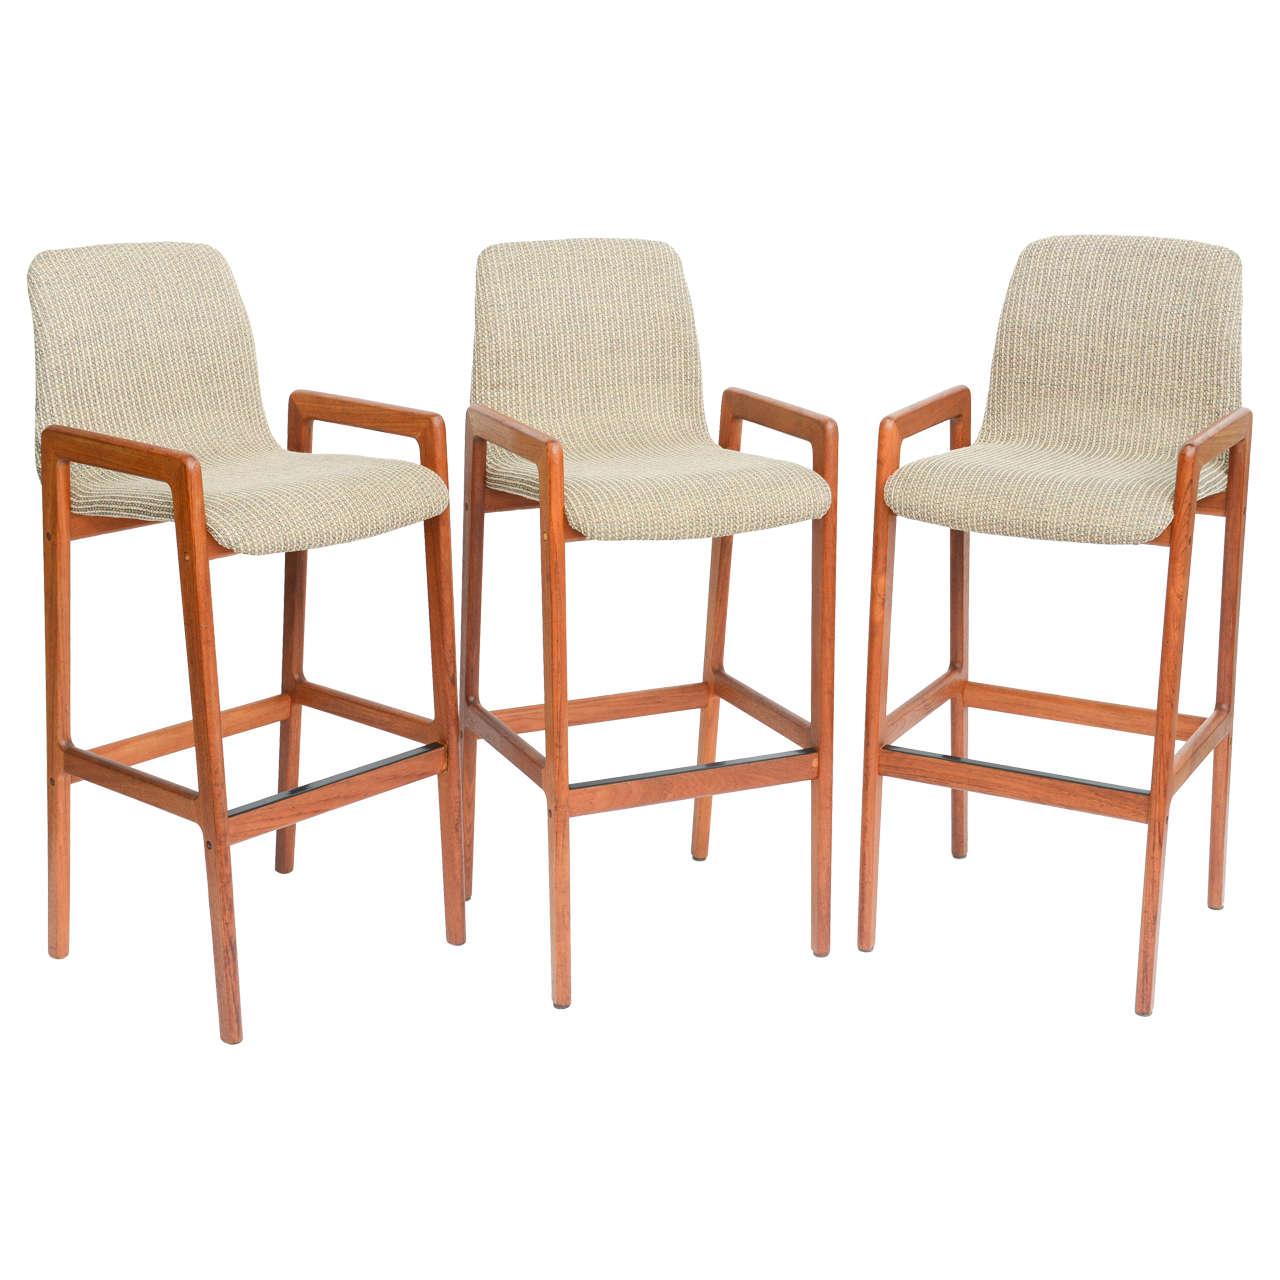 Danish Teak Sculpted Seat Barstools At 1stdibs